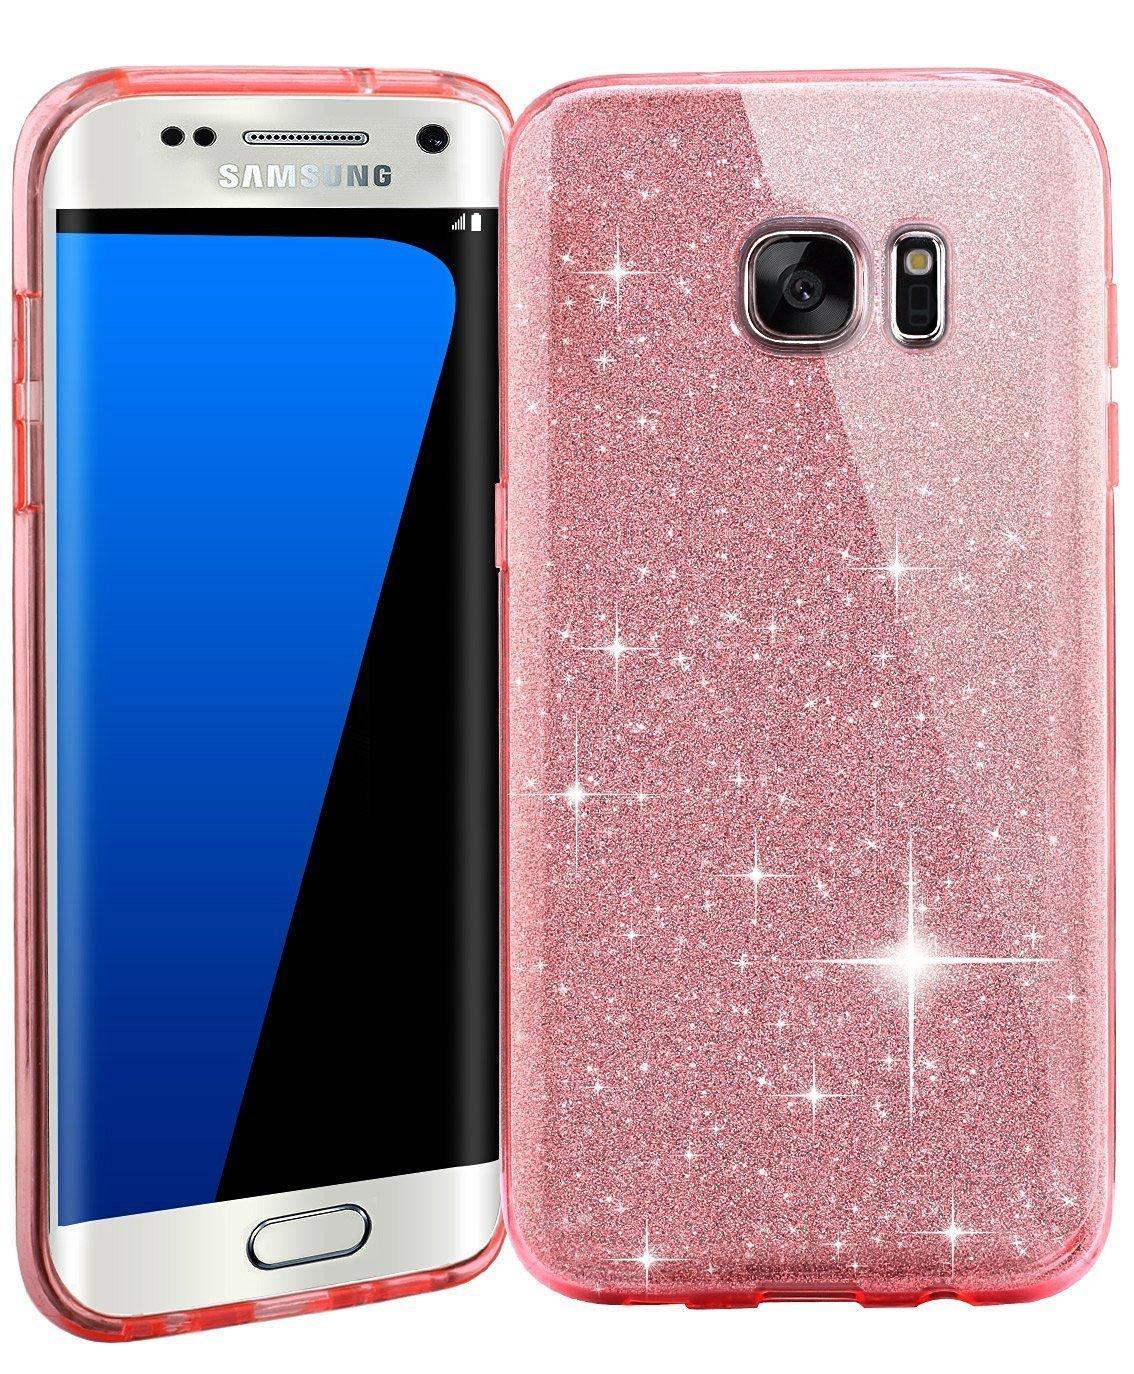 Inspirationc [Secret Garden] TPU メッキ クリアシャイニーカバーシリーズ Samsung Galaxy S7/S7 Edge スワロフスキー Samsung Galaxy S8(2017) B06ZY5FF4M Samsung Galaxy S8(2017) ピンク ピンク Samsung Galaxy S8(2017)